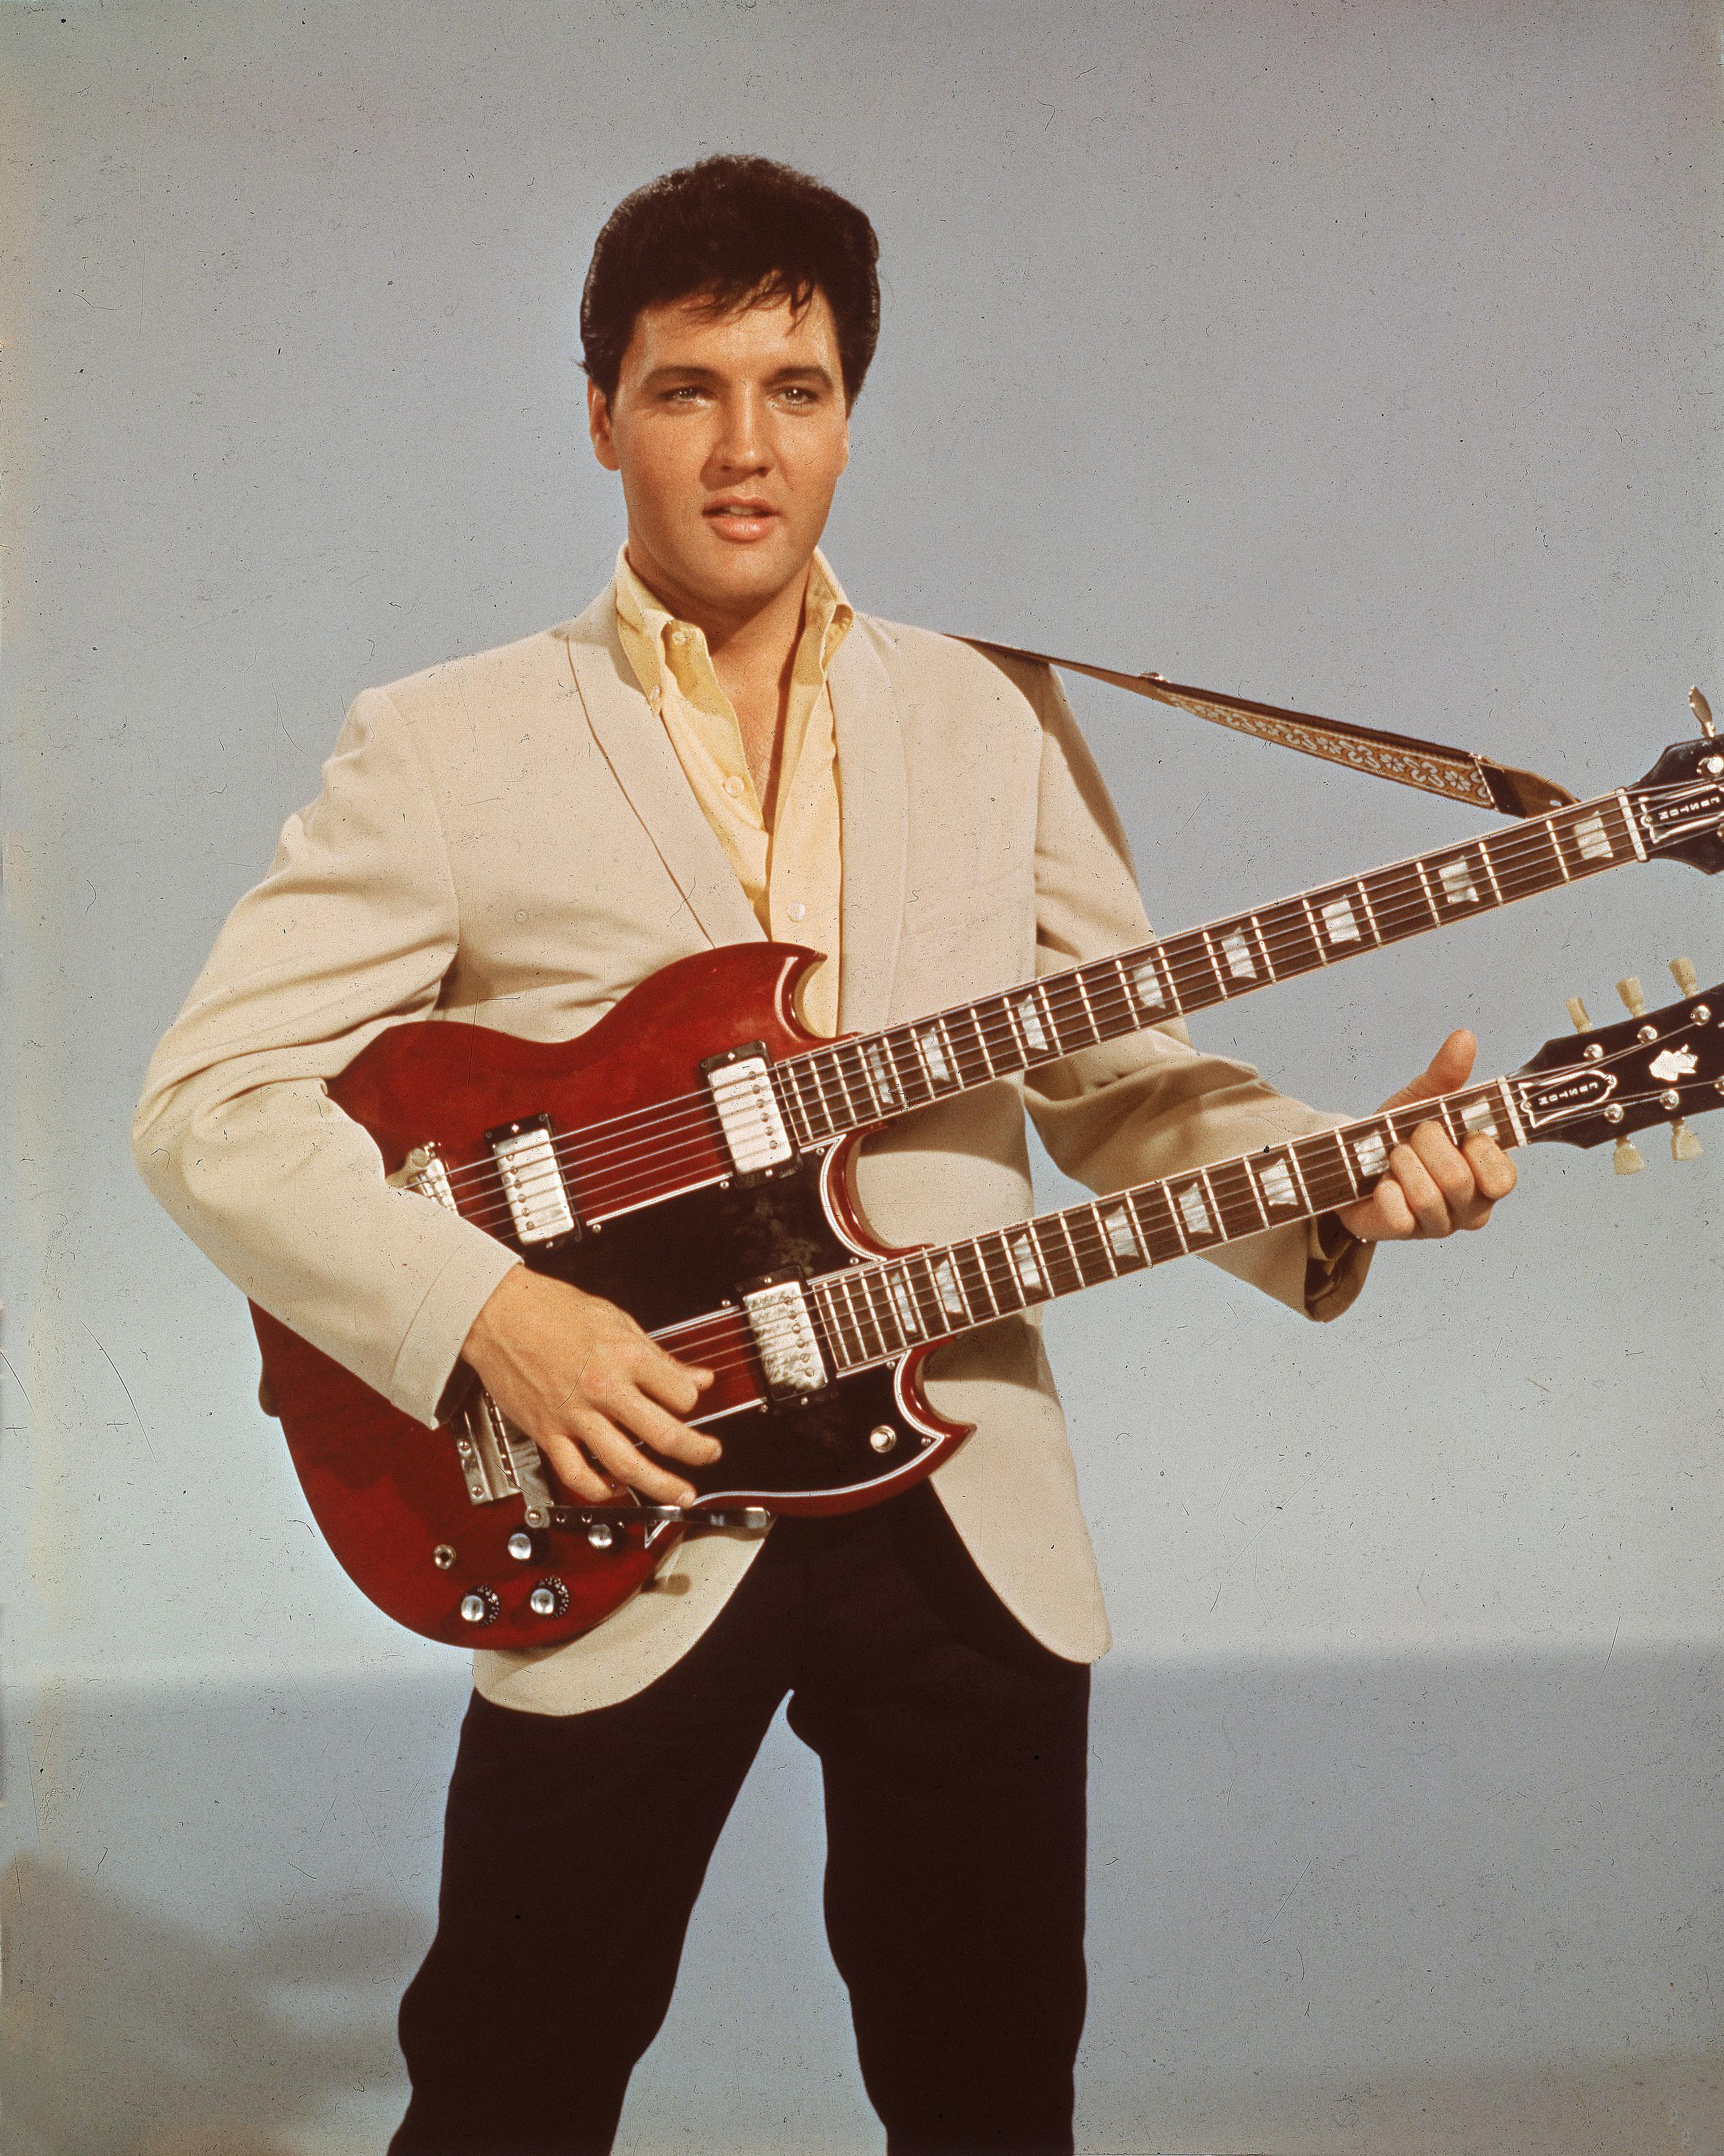 Portrait Of Elvis Presley